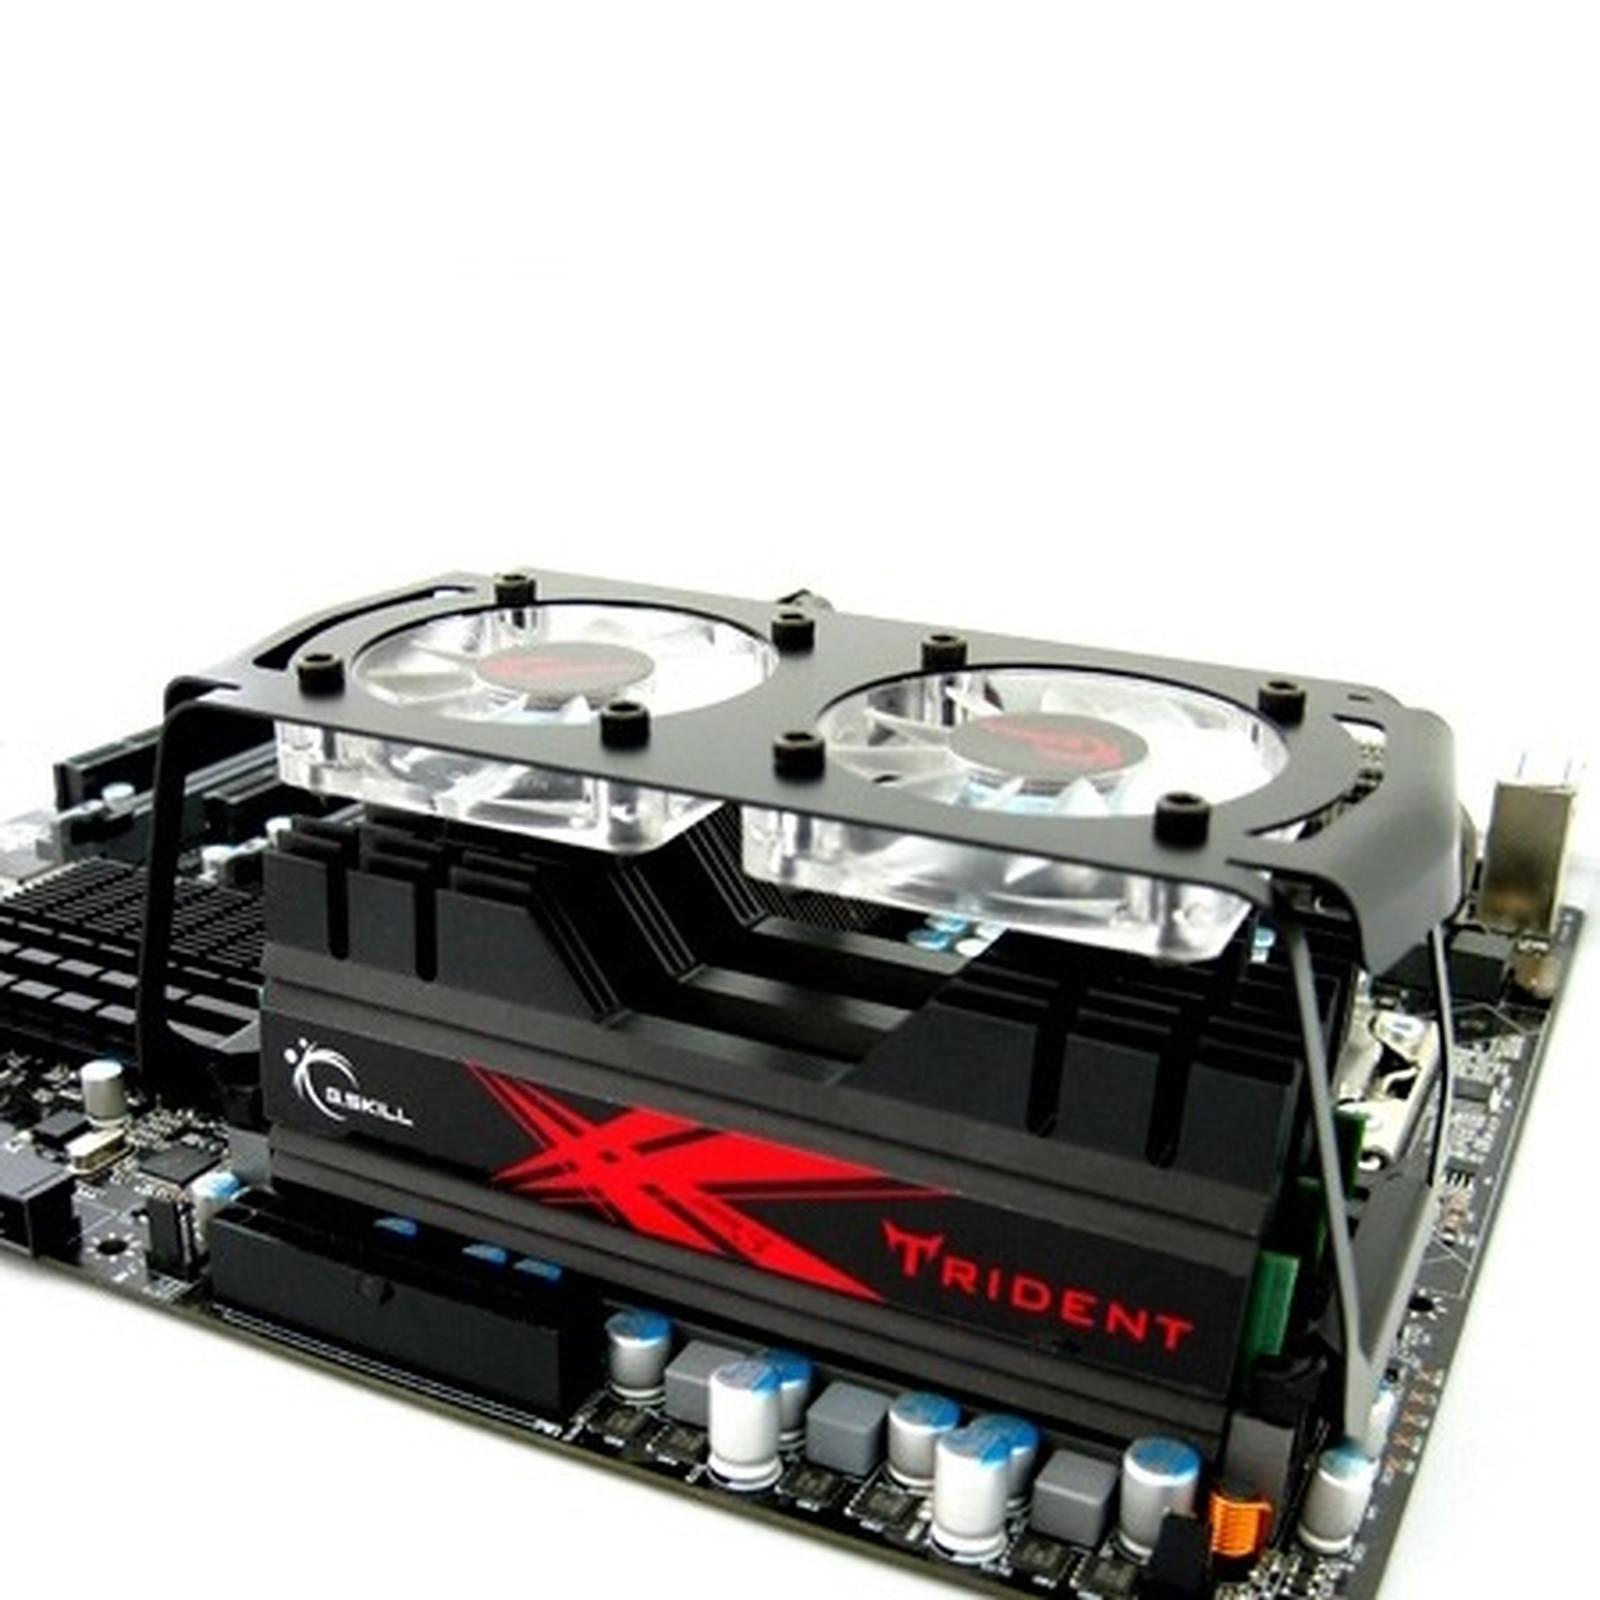 G.Skill Trident Series 24 Go (6x 4Go) DDR3 2000 MHz